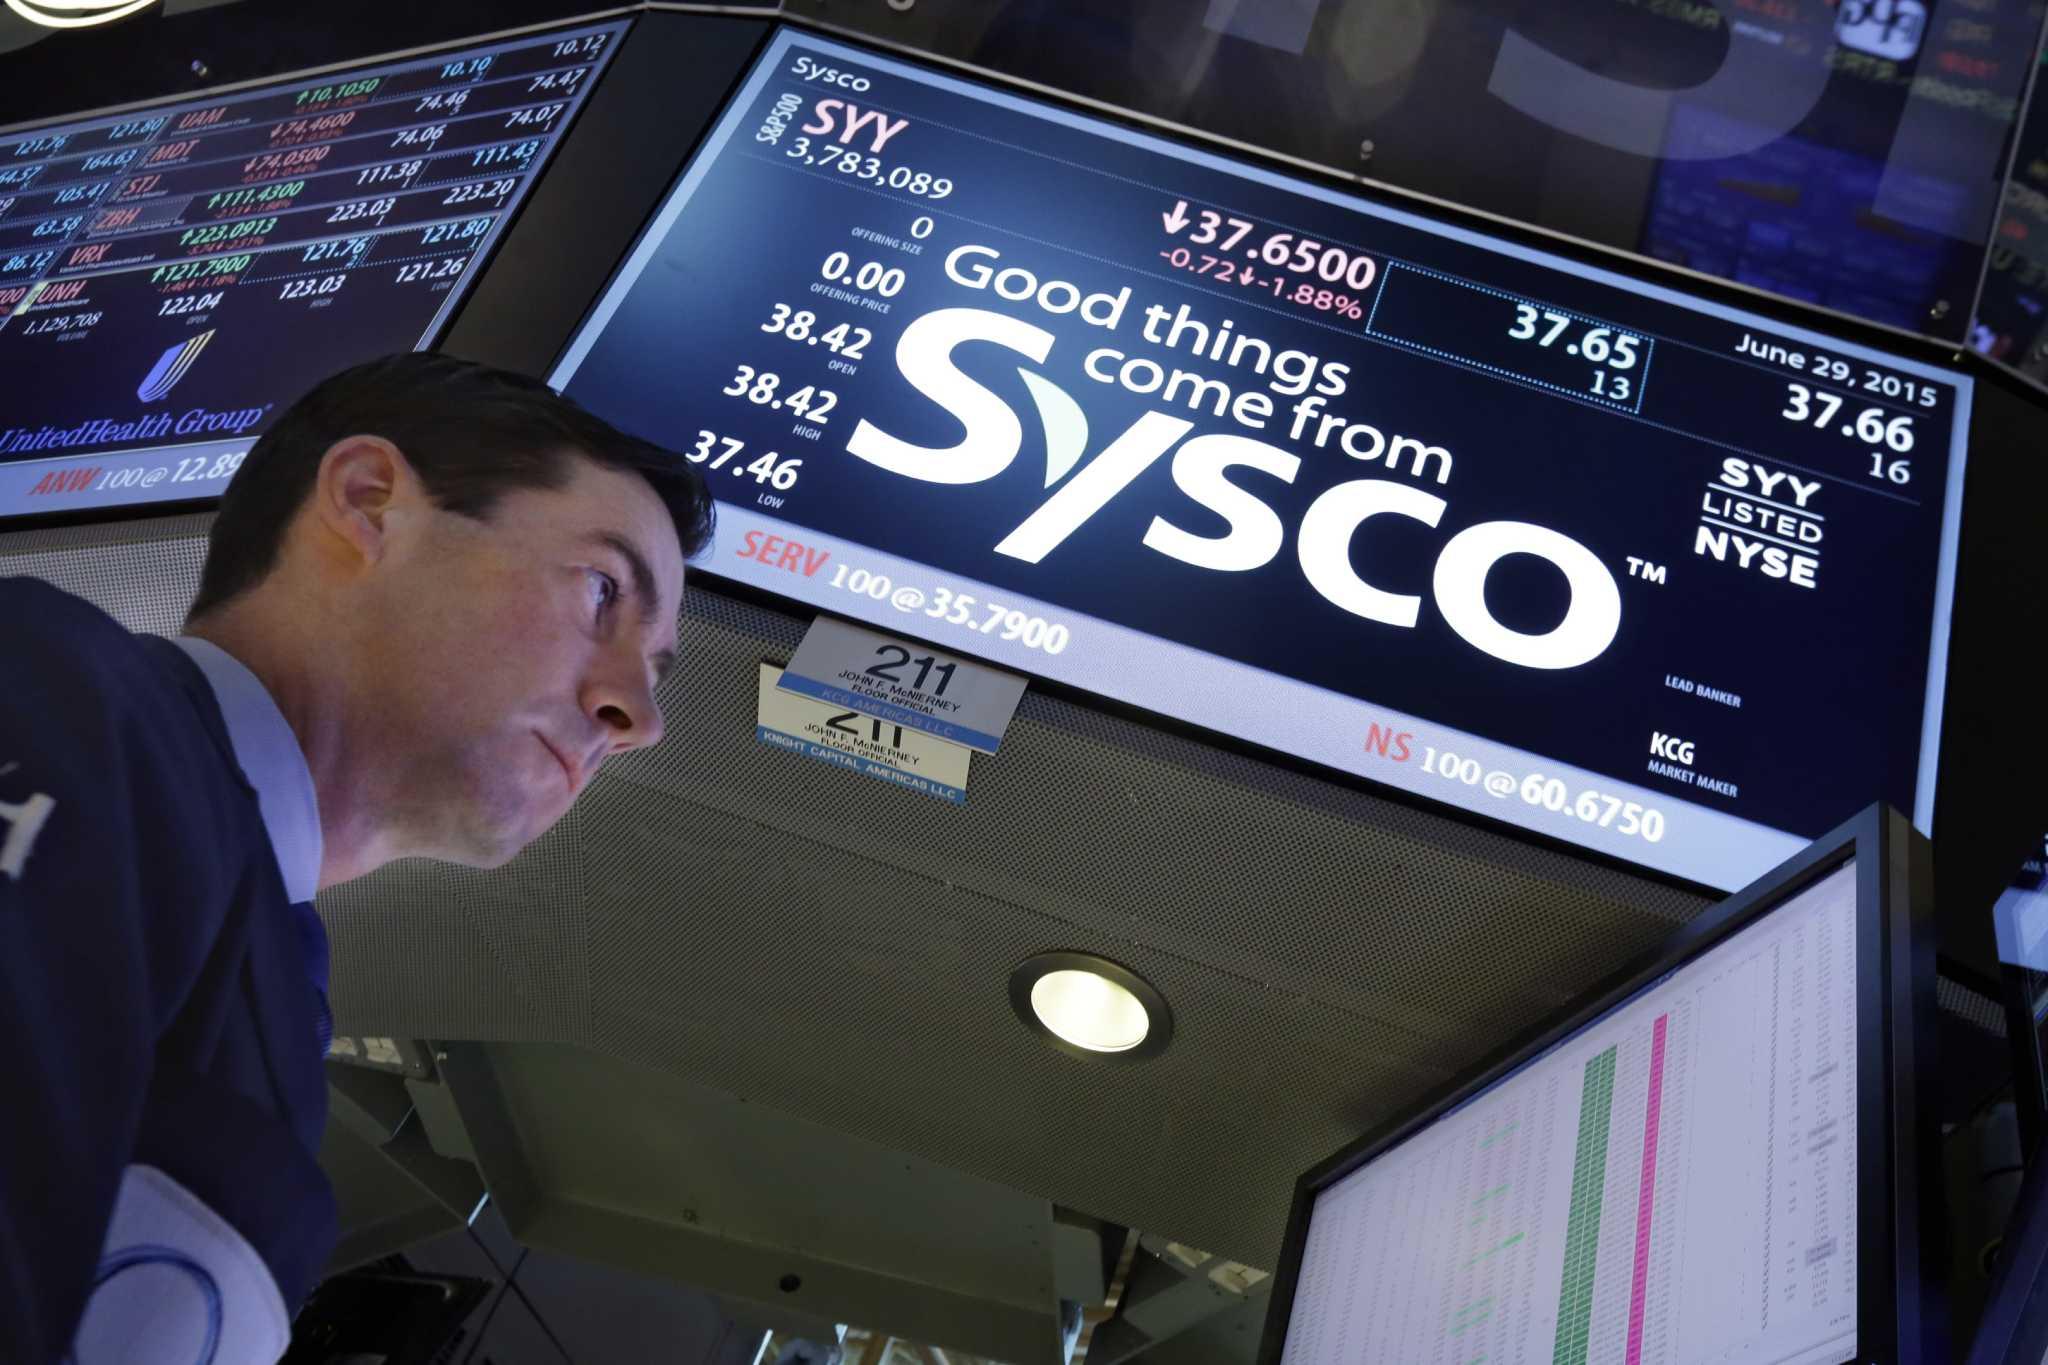 Sysco earnings jump 33 percent, beating Wall St  estimates